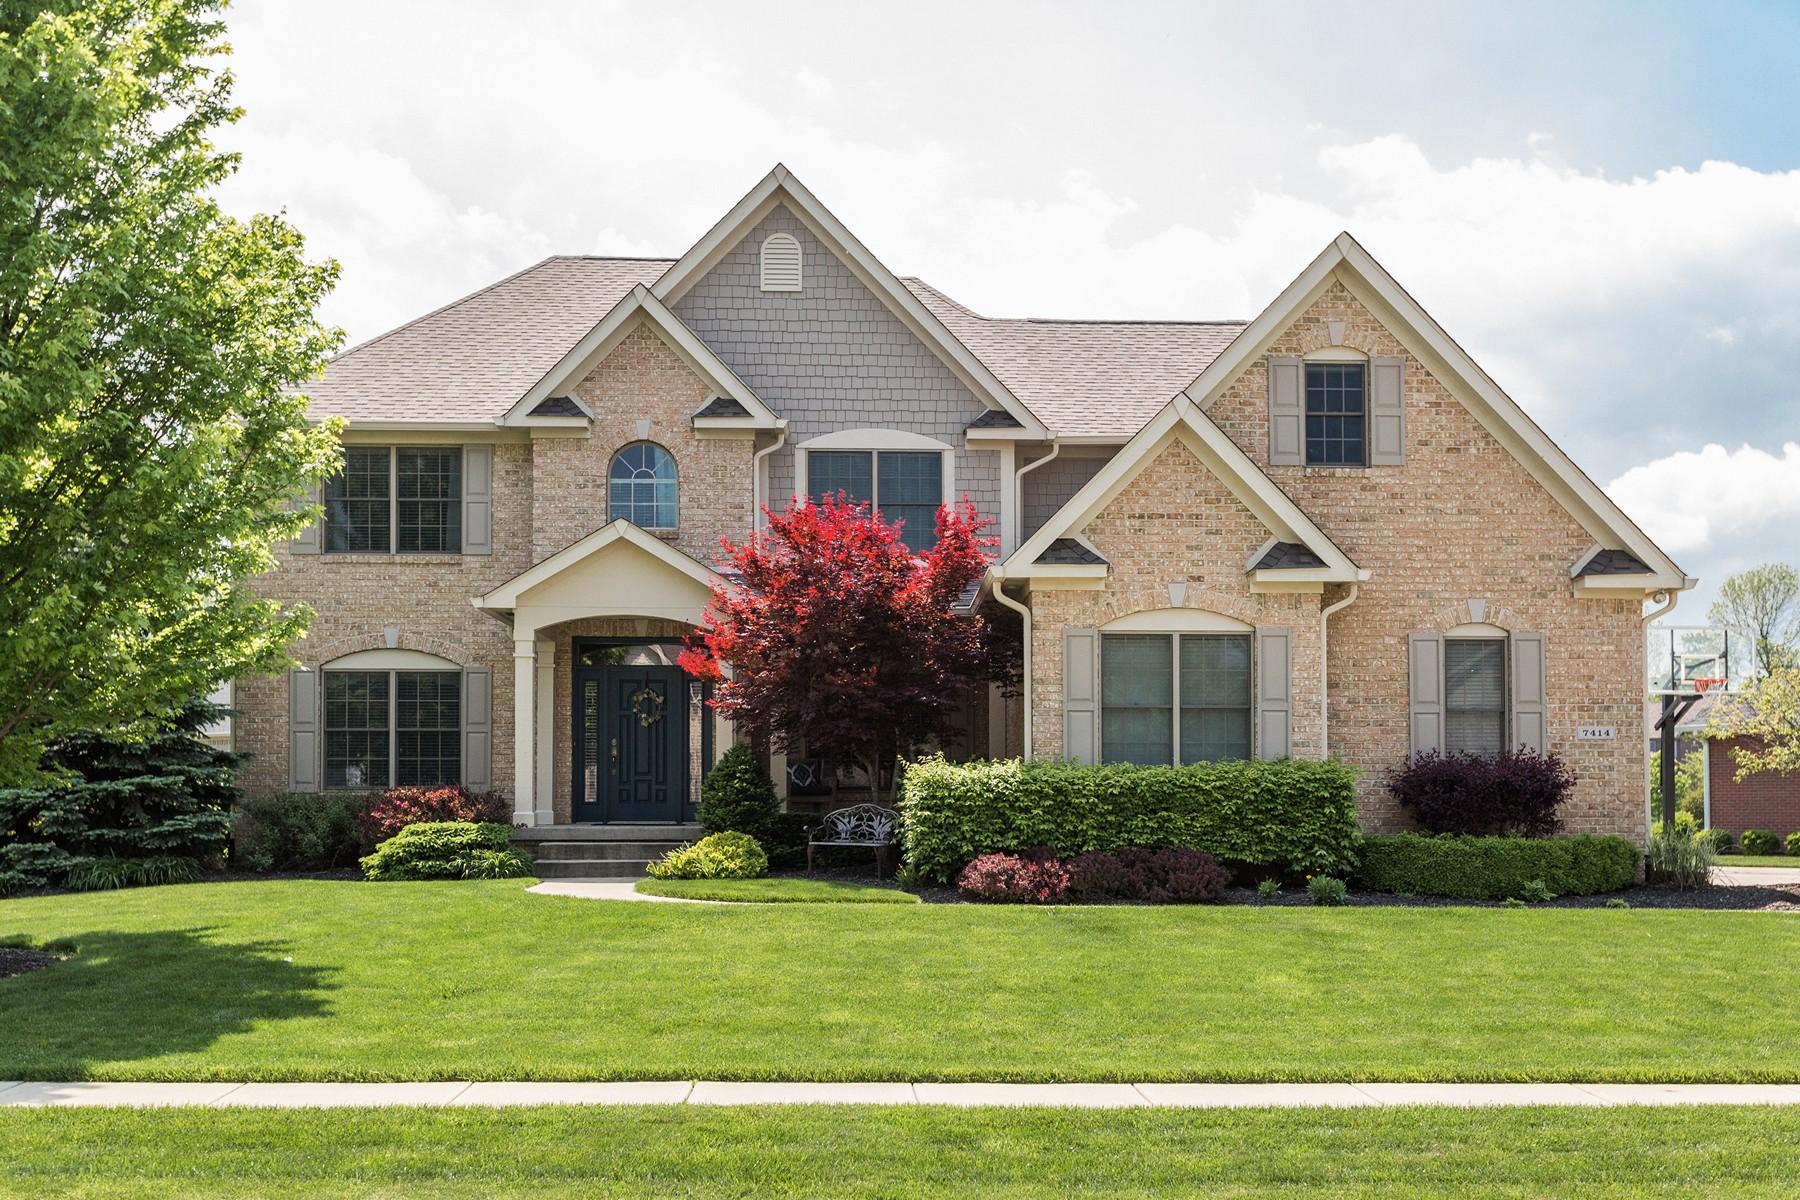 Casa Unifamiliar por un Venta en Gorgeous Home Ready For You 7414 Stones River Drive Indianapolis, Indiana 46259 Estados Unidos